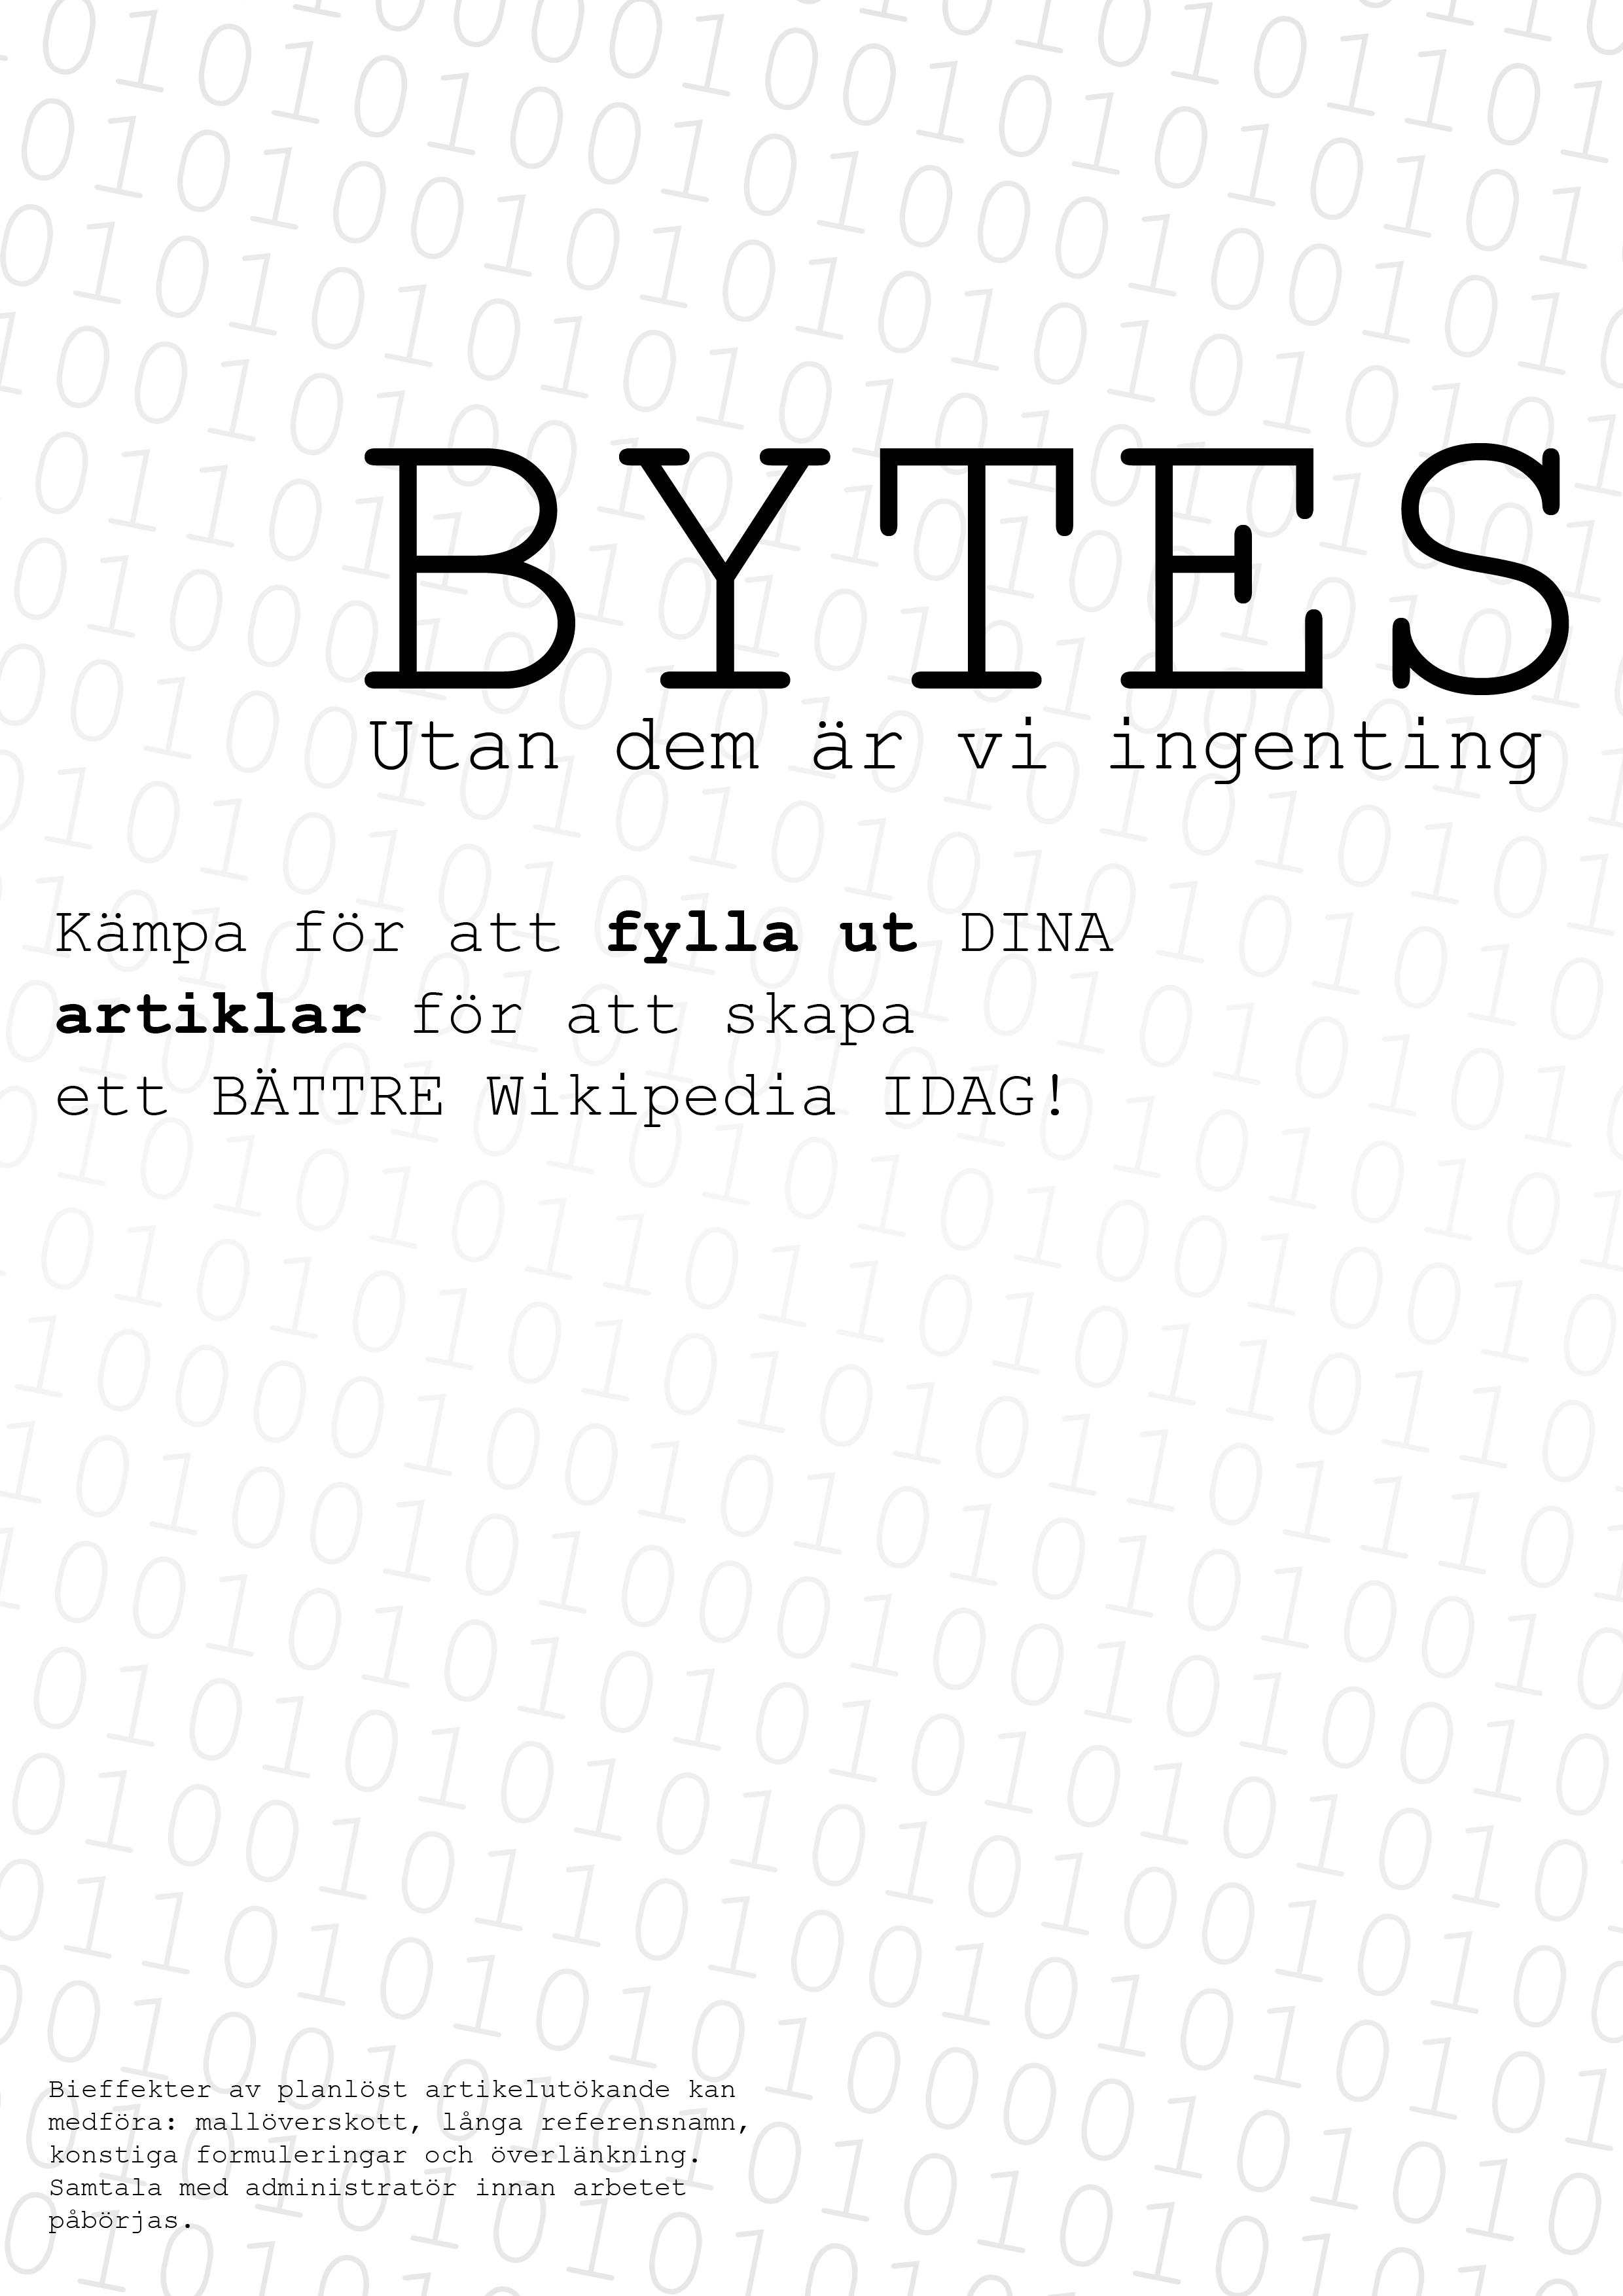 File:Bytes.